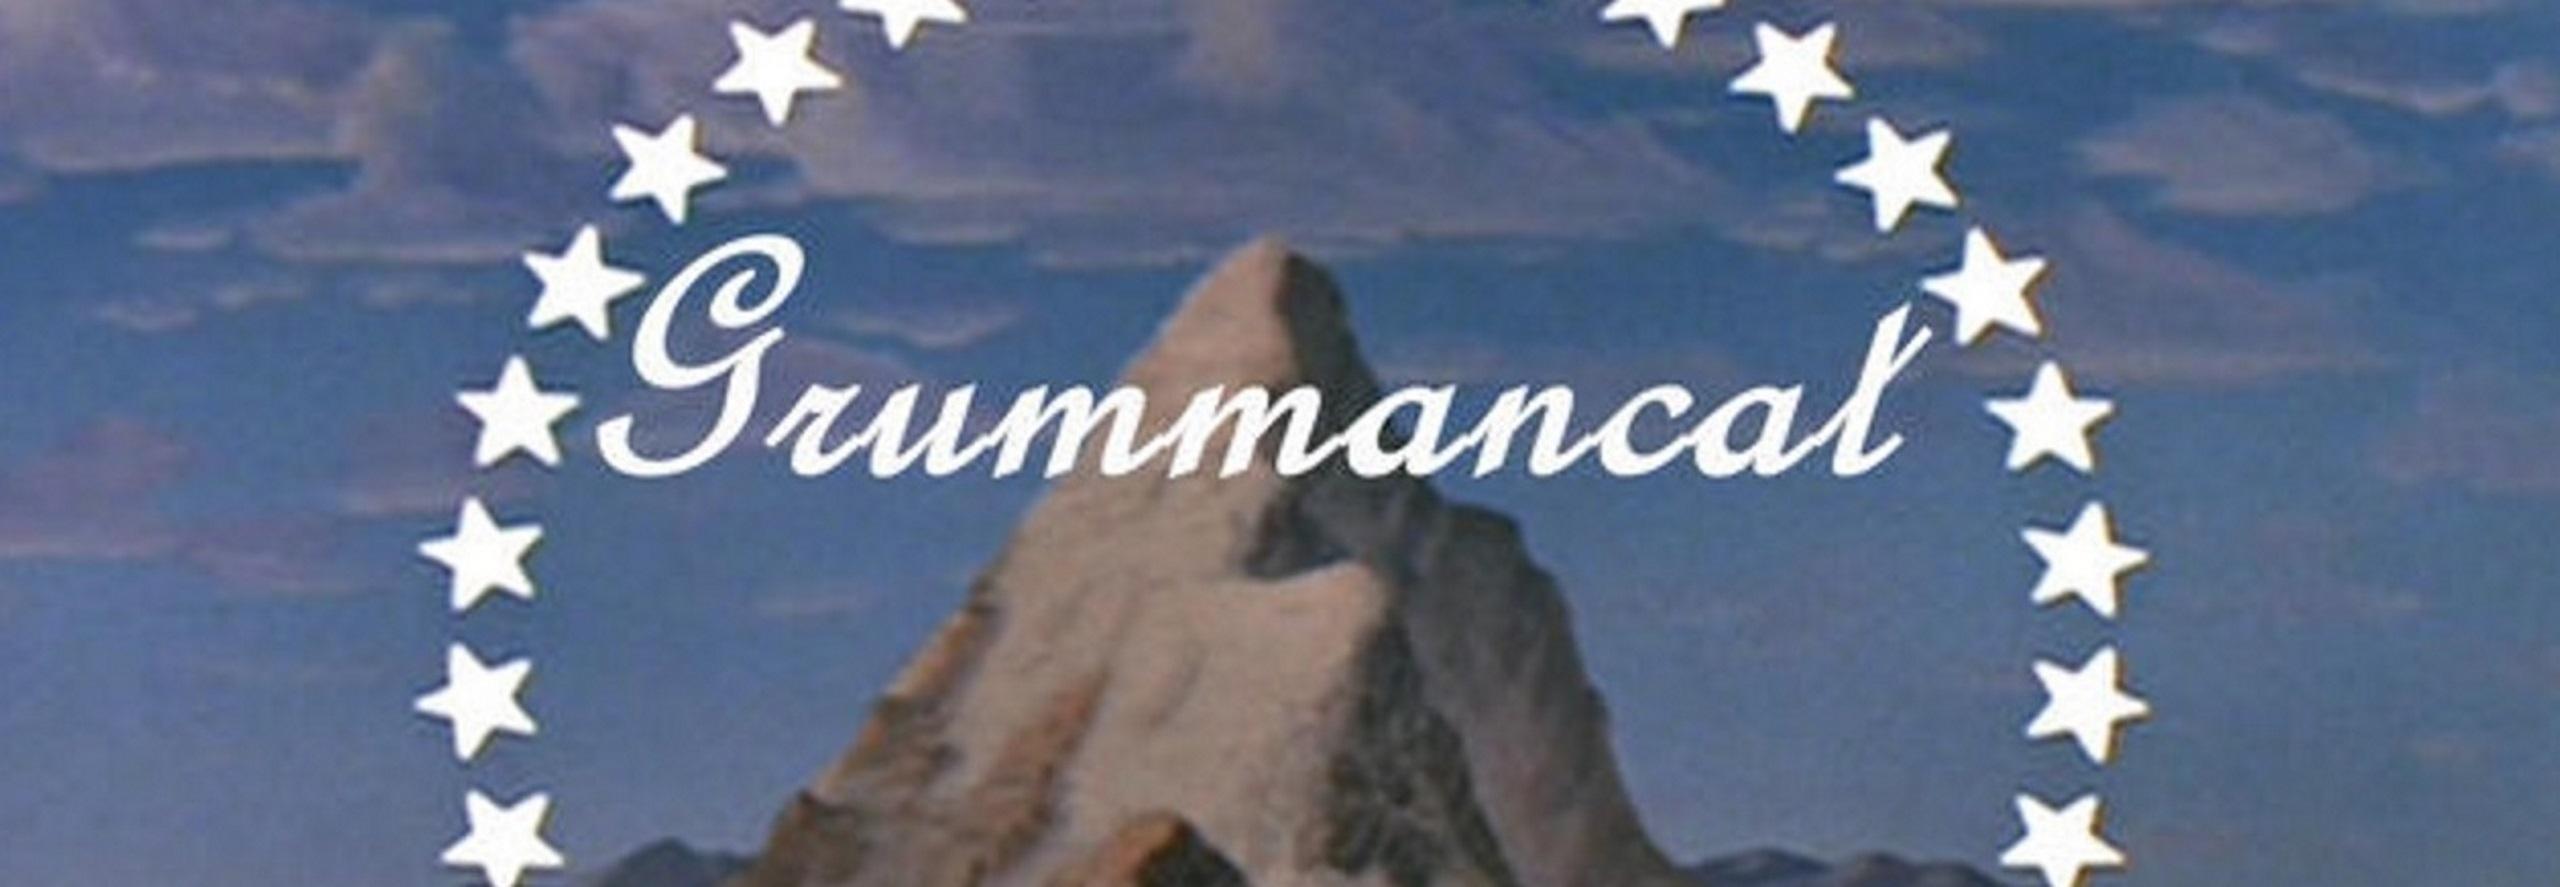 Grummancat (@grummancat) Cover Image